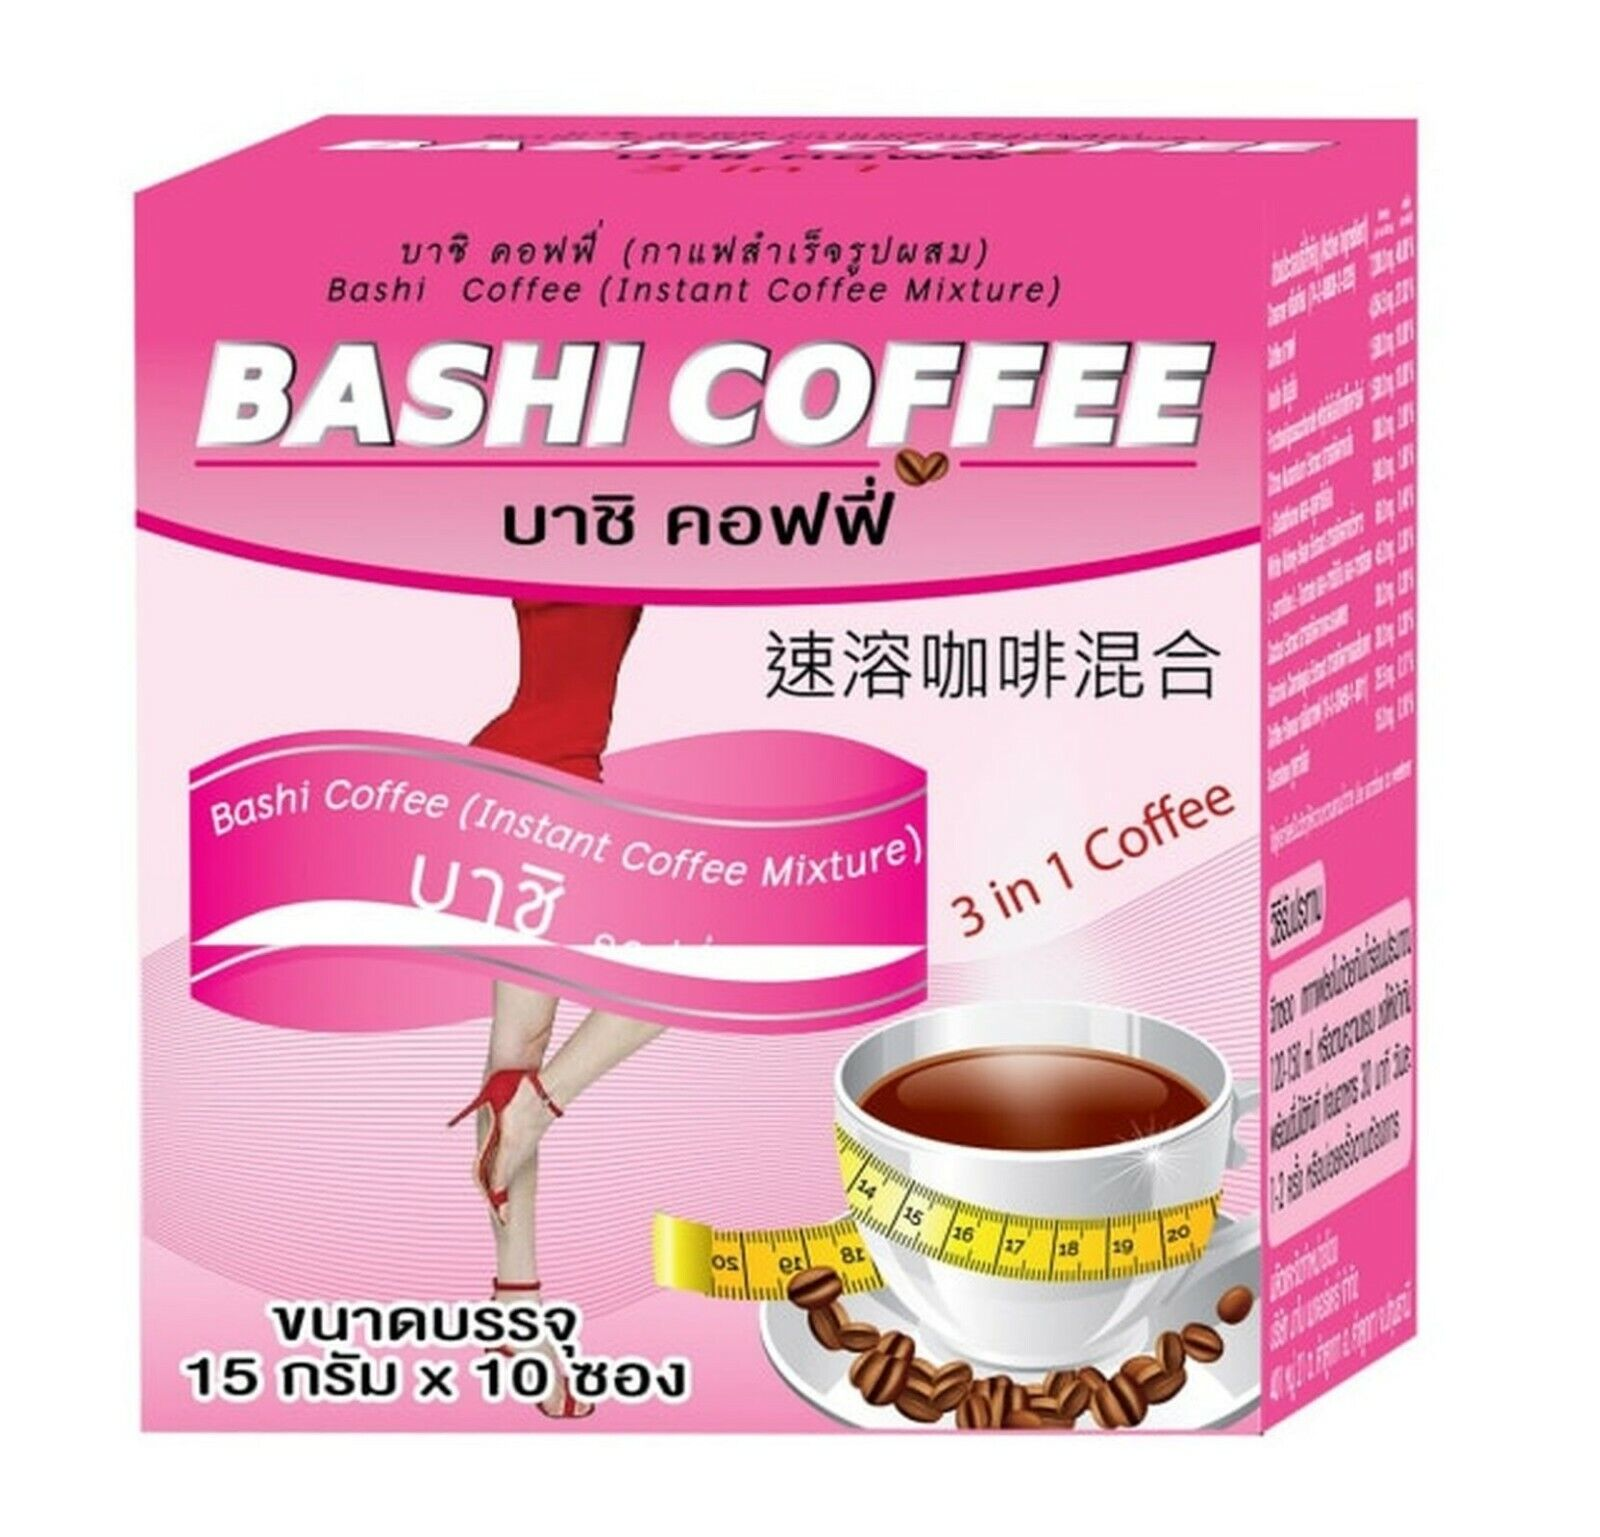 Baschi Slimming 3 in 1 Coffee Dietary Supplement 10 Sachet